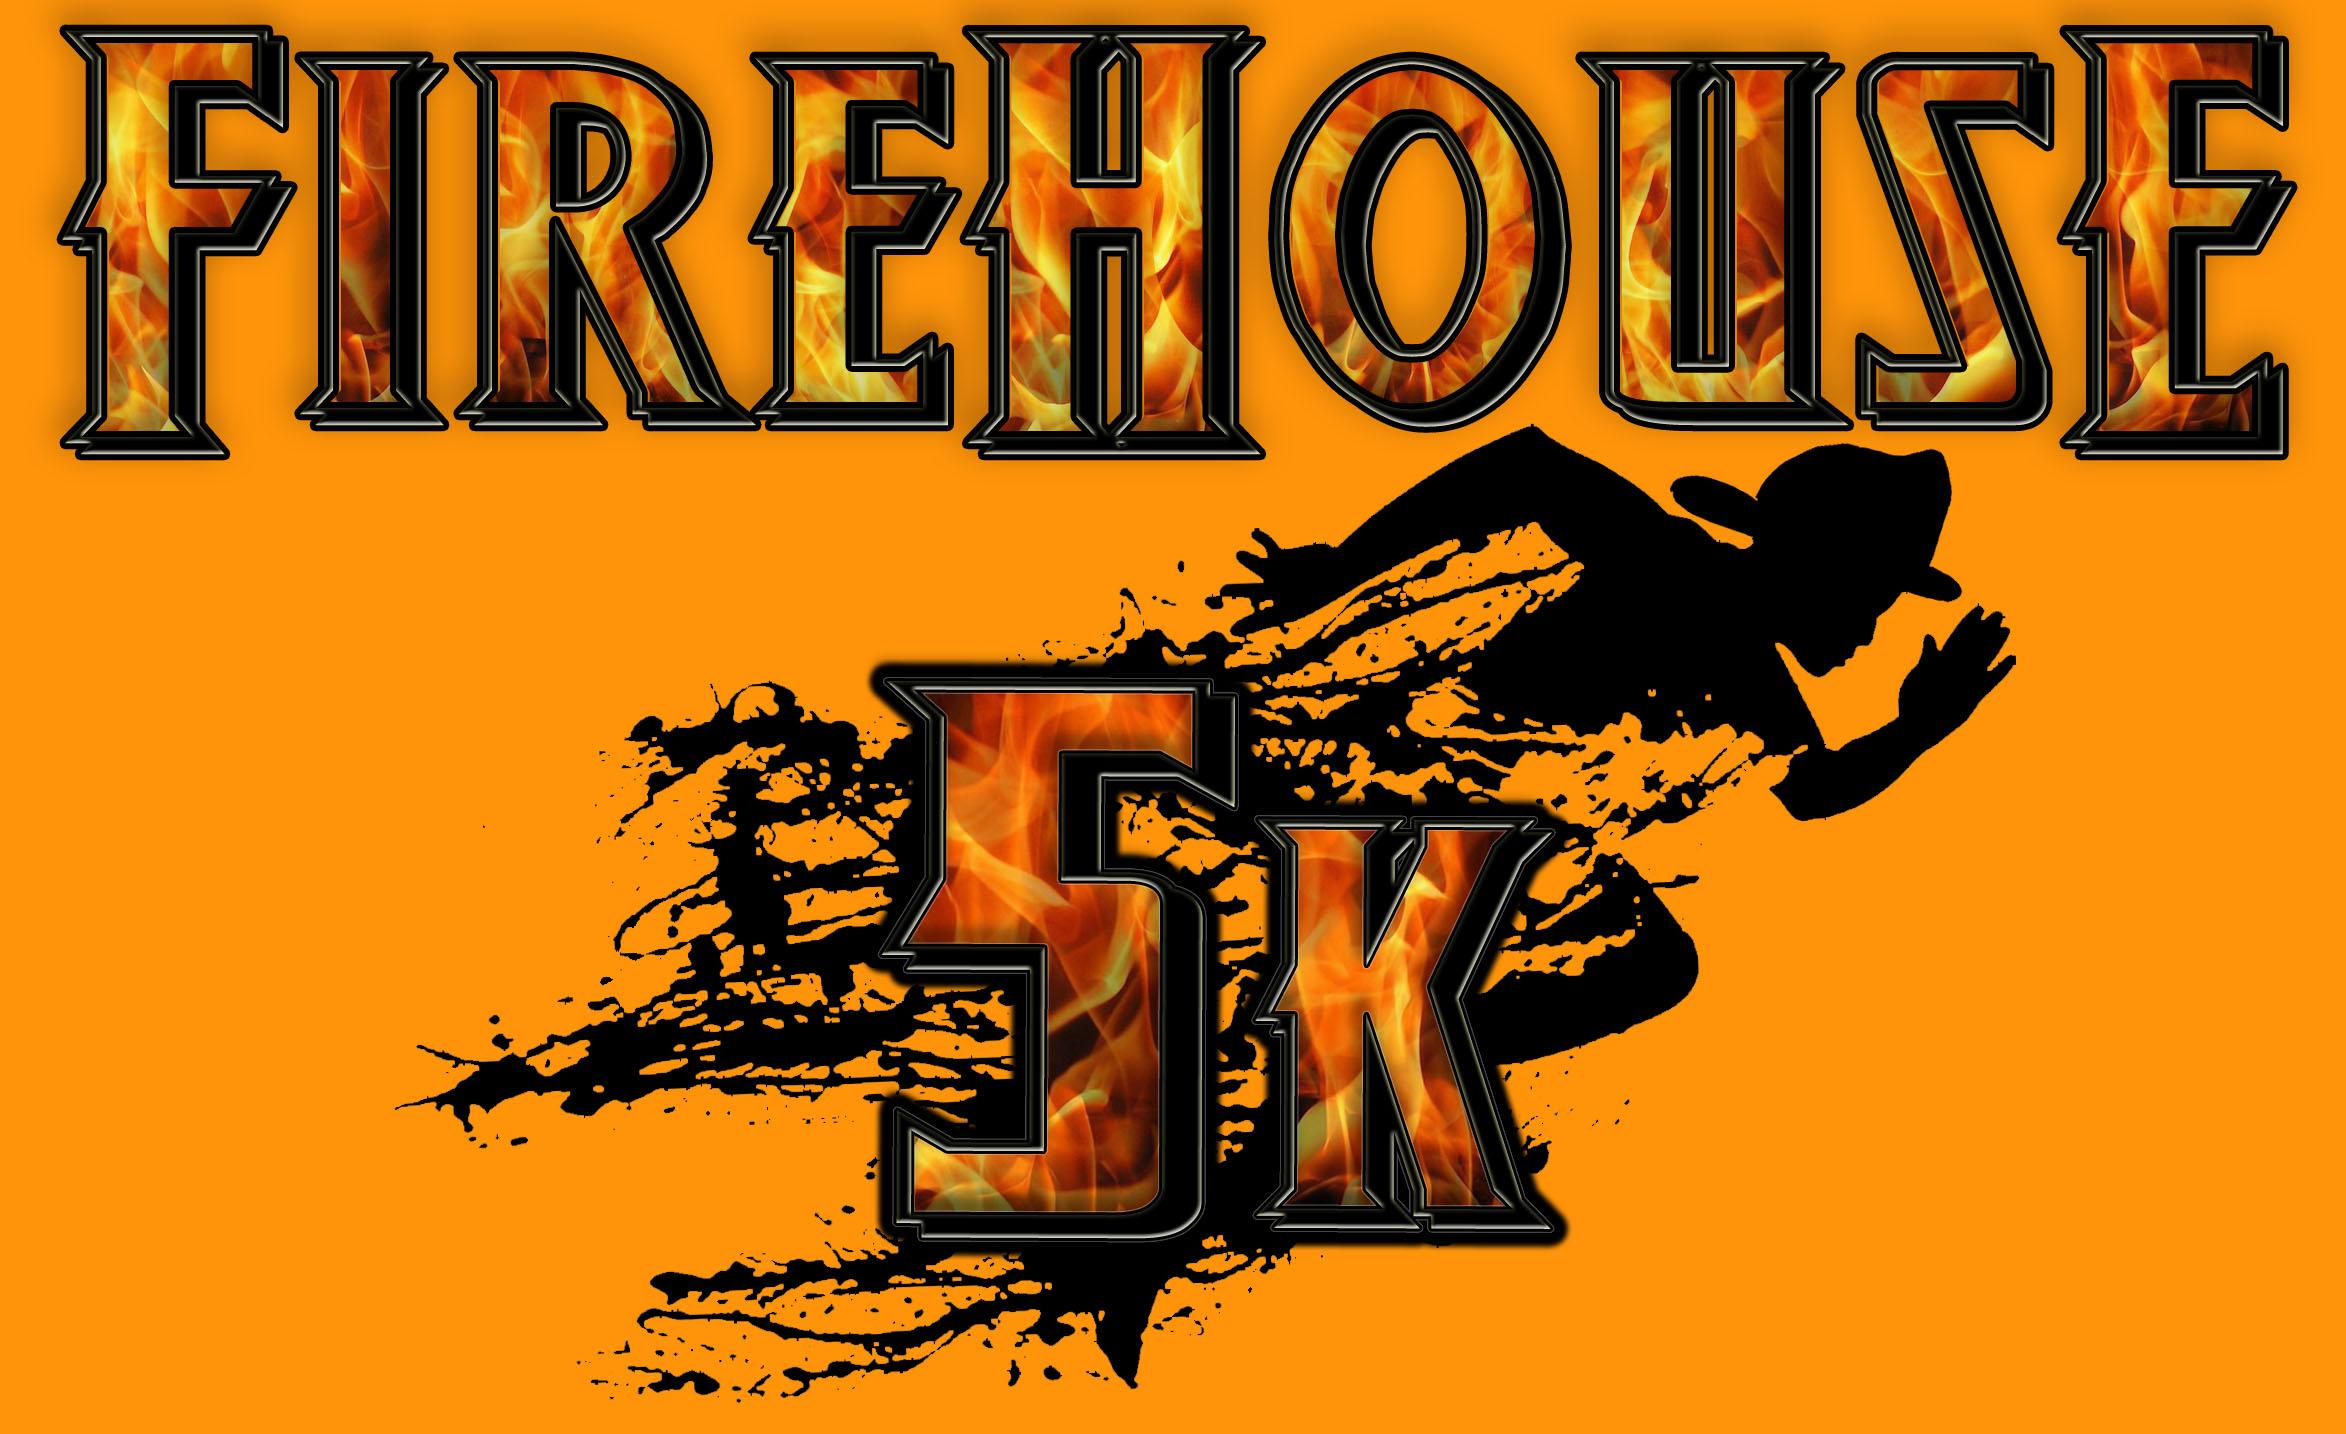 Firehouse 5K